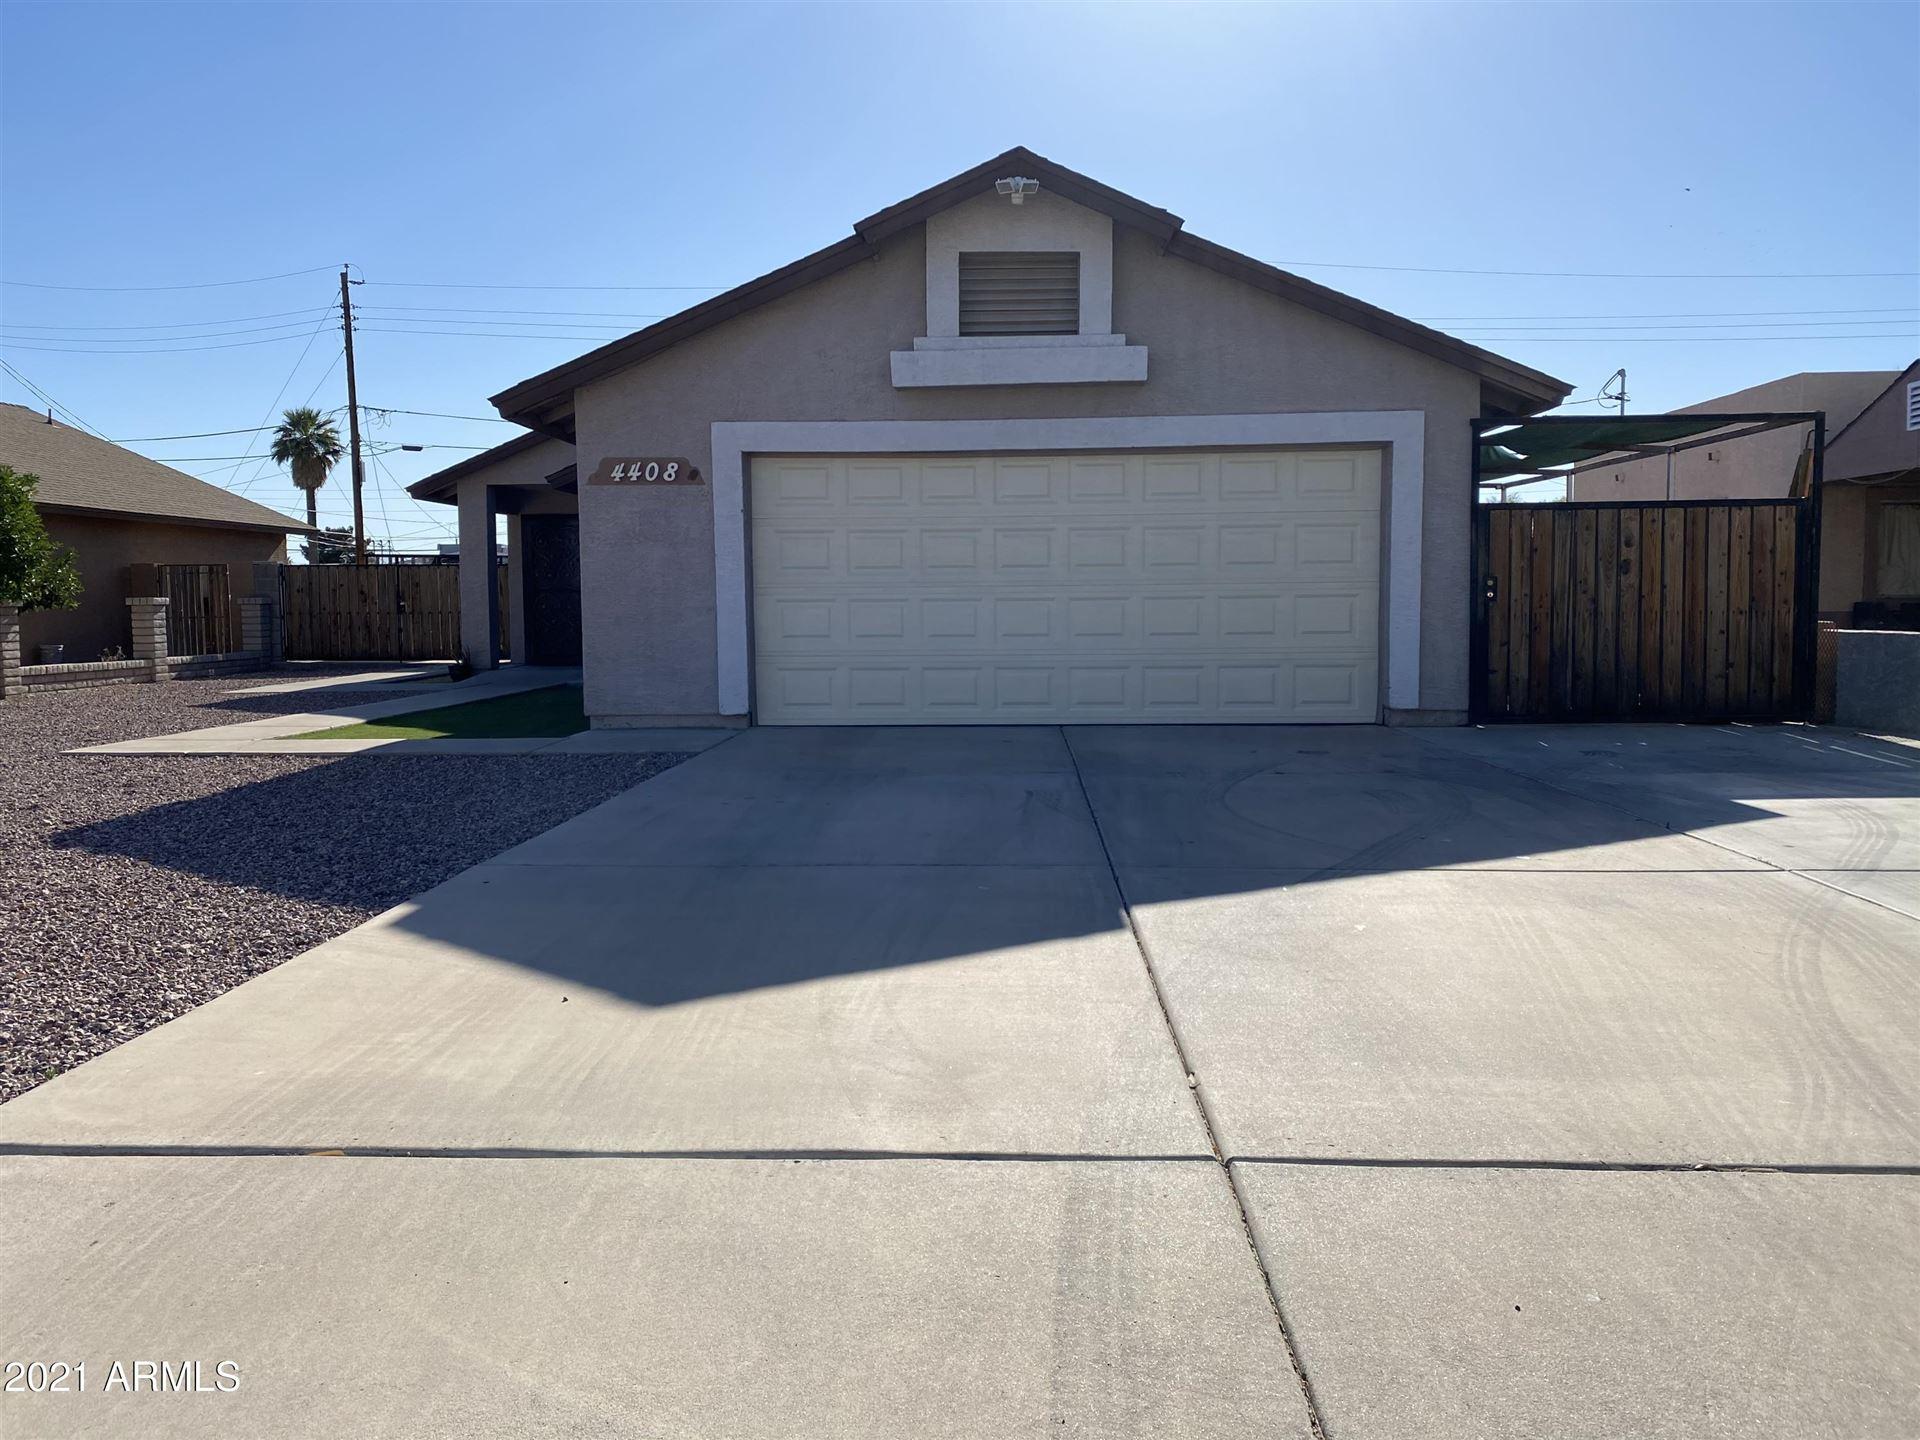 4408 N 22ND Drive, Phoenix, AZ 85015 - MLS#: 6244011